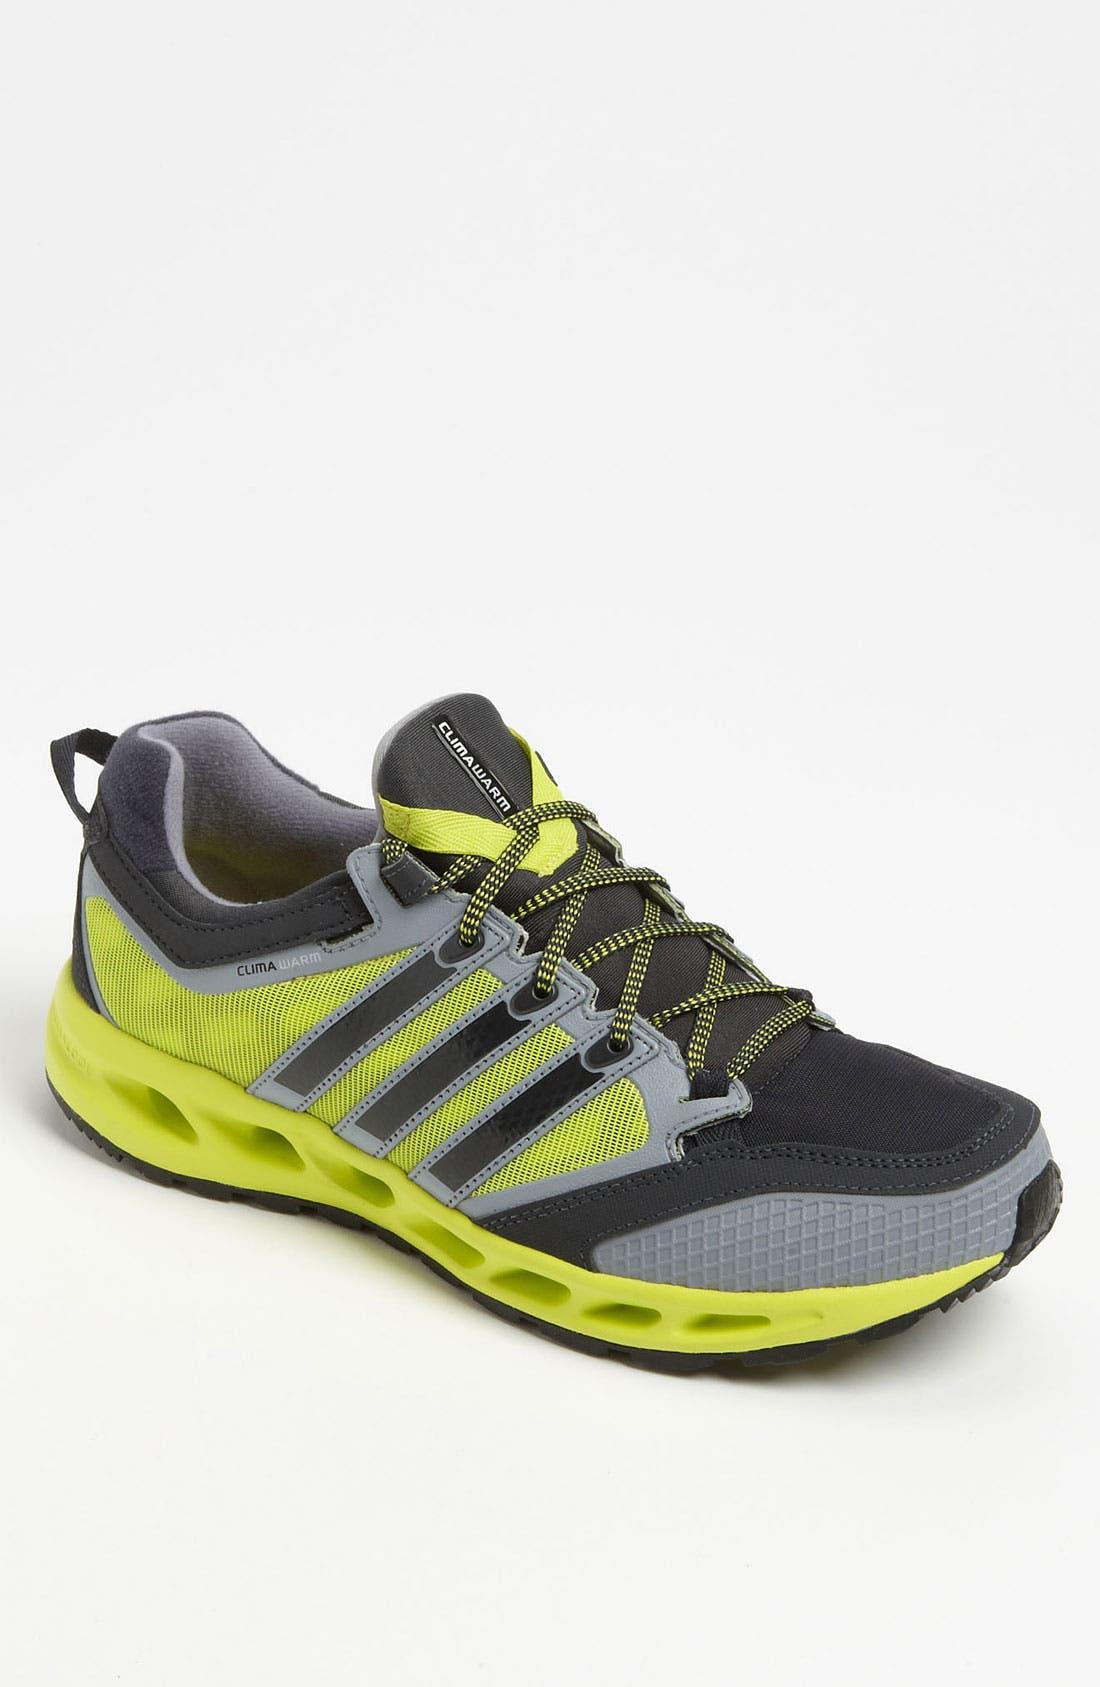 Alternate Image 1 Selected - adidas 'Tempest' Running Shoe (Men)